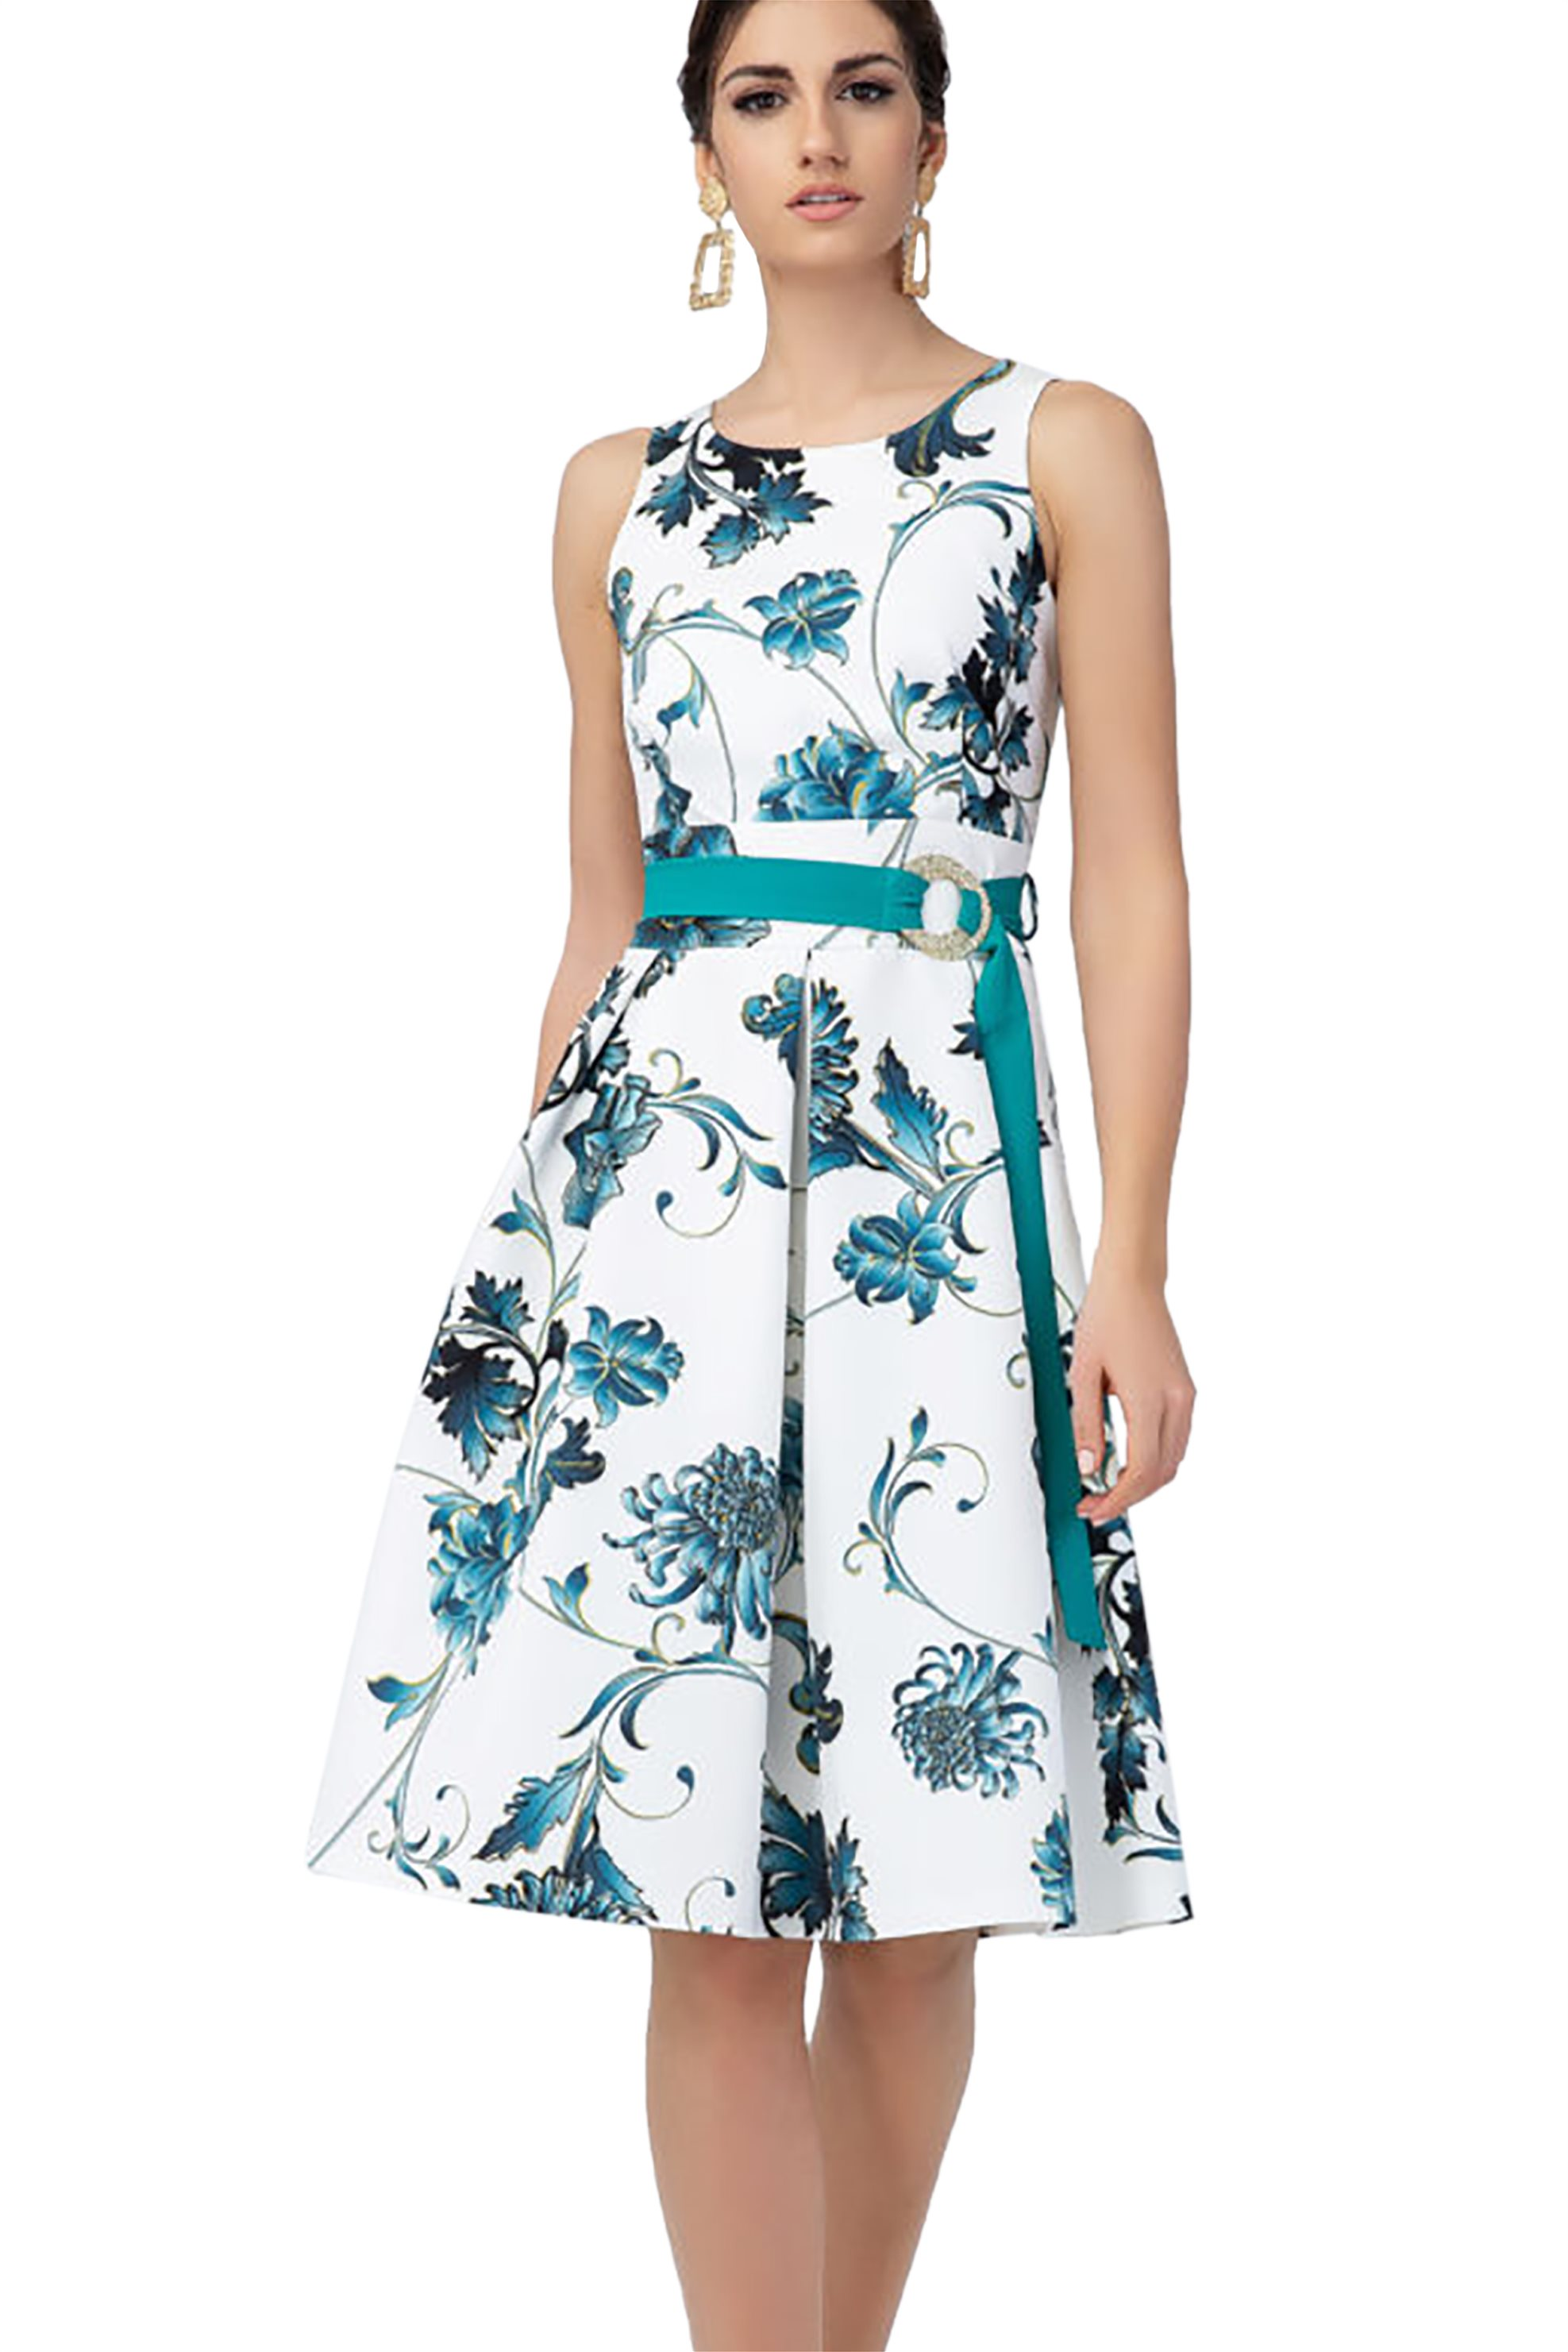 Billy Sabbado γυναικείο αμάνικο φόρεμα με floral prin και ζώνη - 0208970166 - Λε γυναικα   ρουχα   φορέματα   mini φορέματα